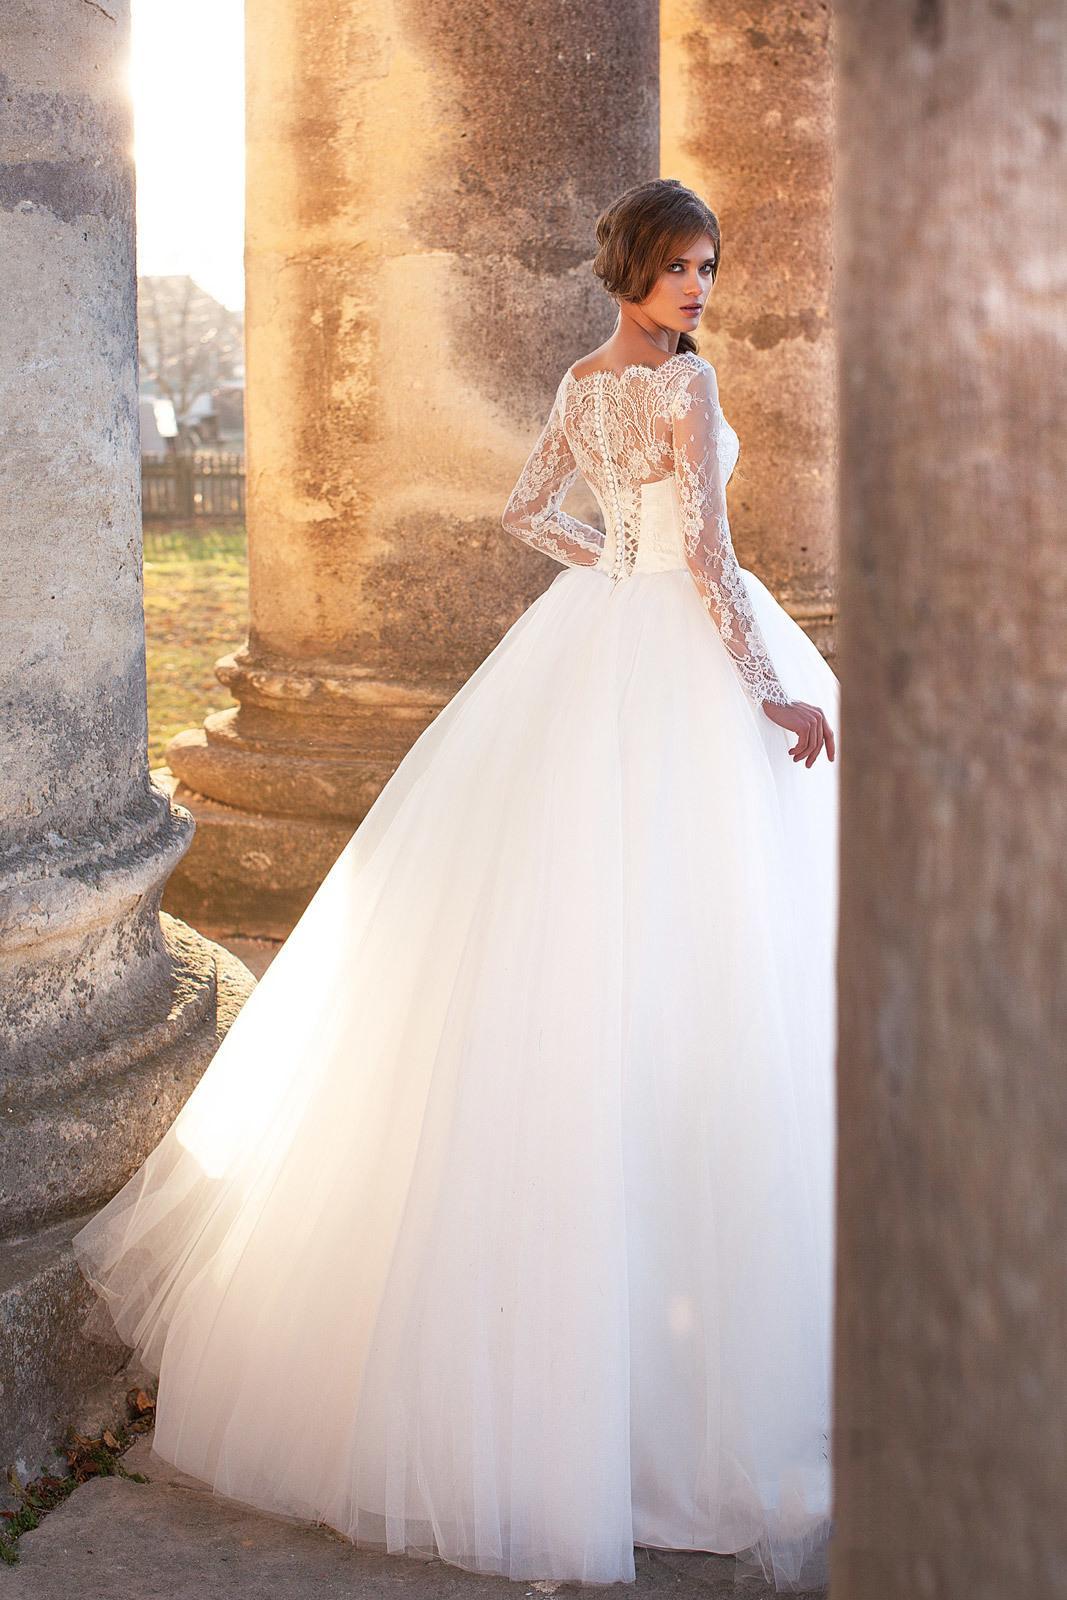 626dbd25b65d E100 Romantic Puffy Ball Gown Wedding Dresses Lace Appliques Long Sleeve  Bateau Neck Court Train Tulle